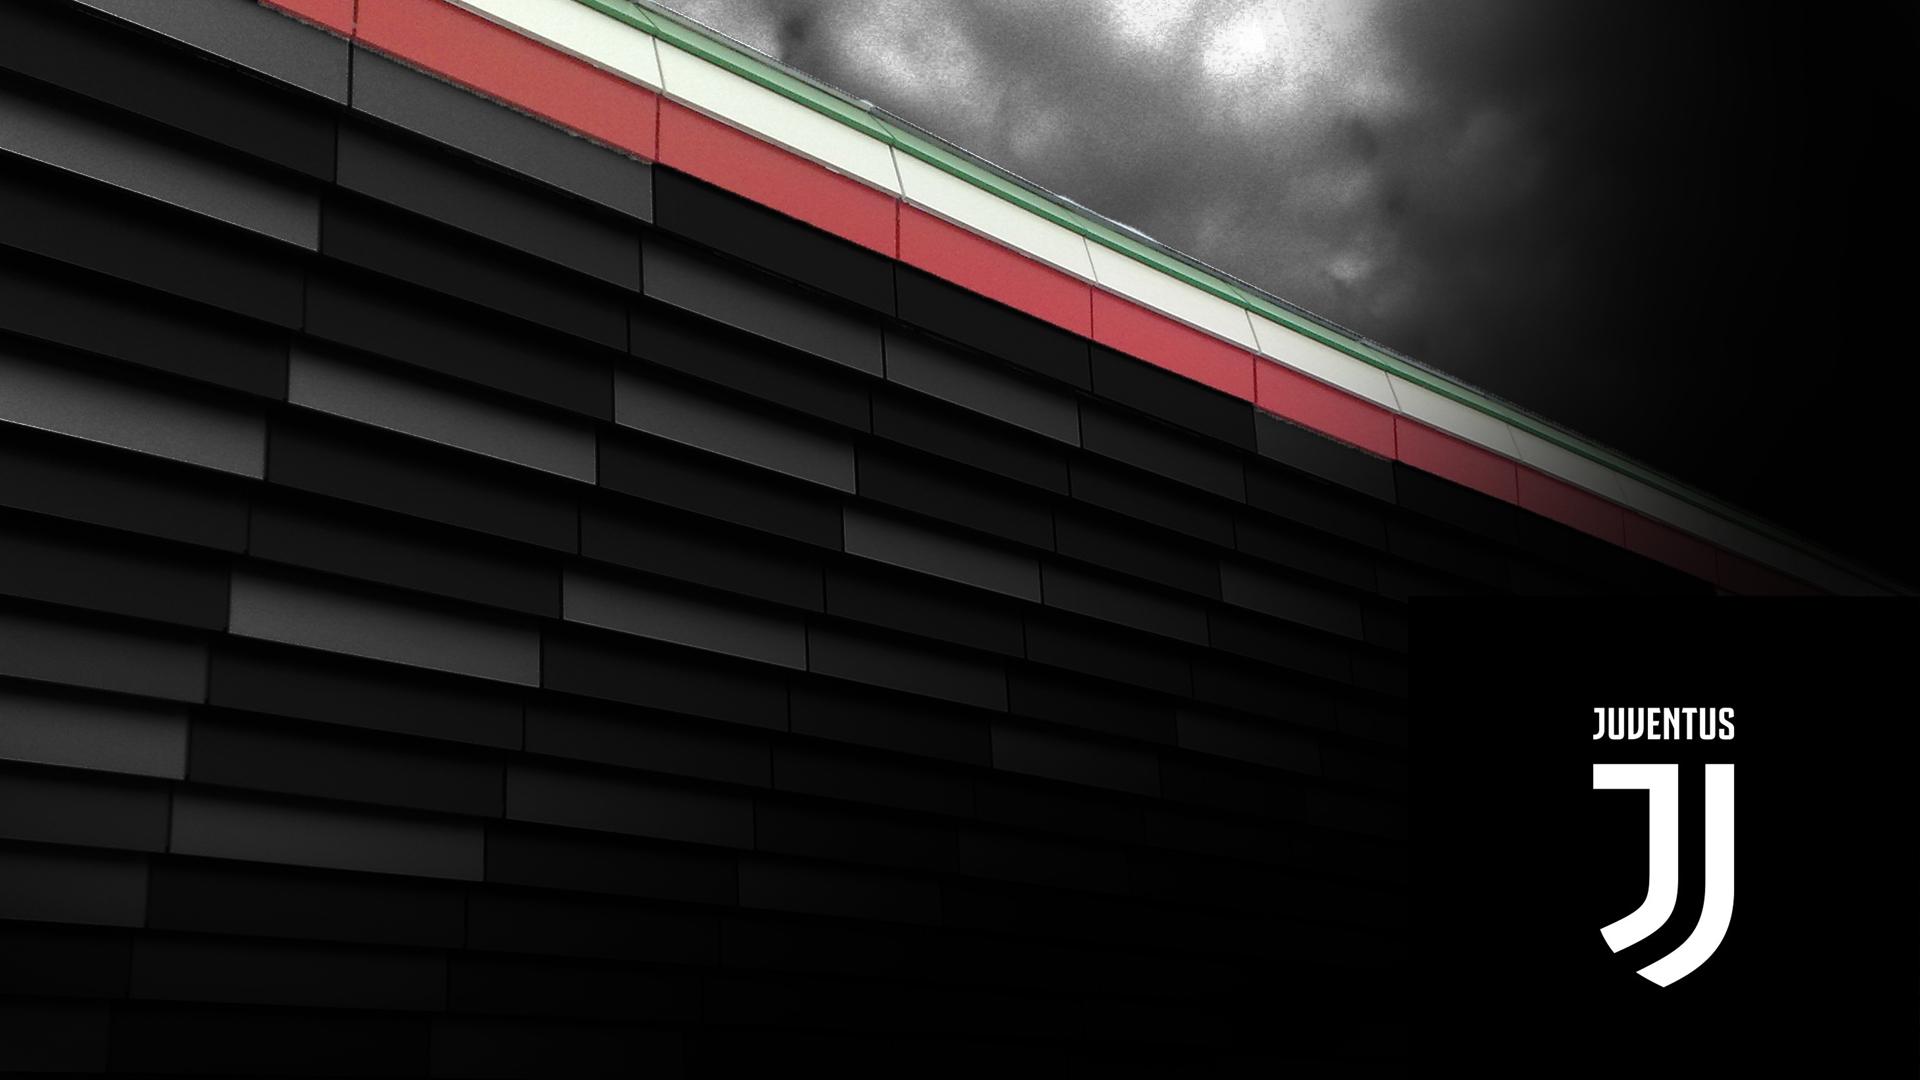 New Car Games >> Wallpaper : Juventus, Juve 1920x1080 - luisjuve1897 - 1158091 - HD Wallpapers - WallHere